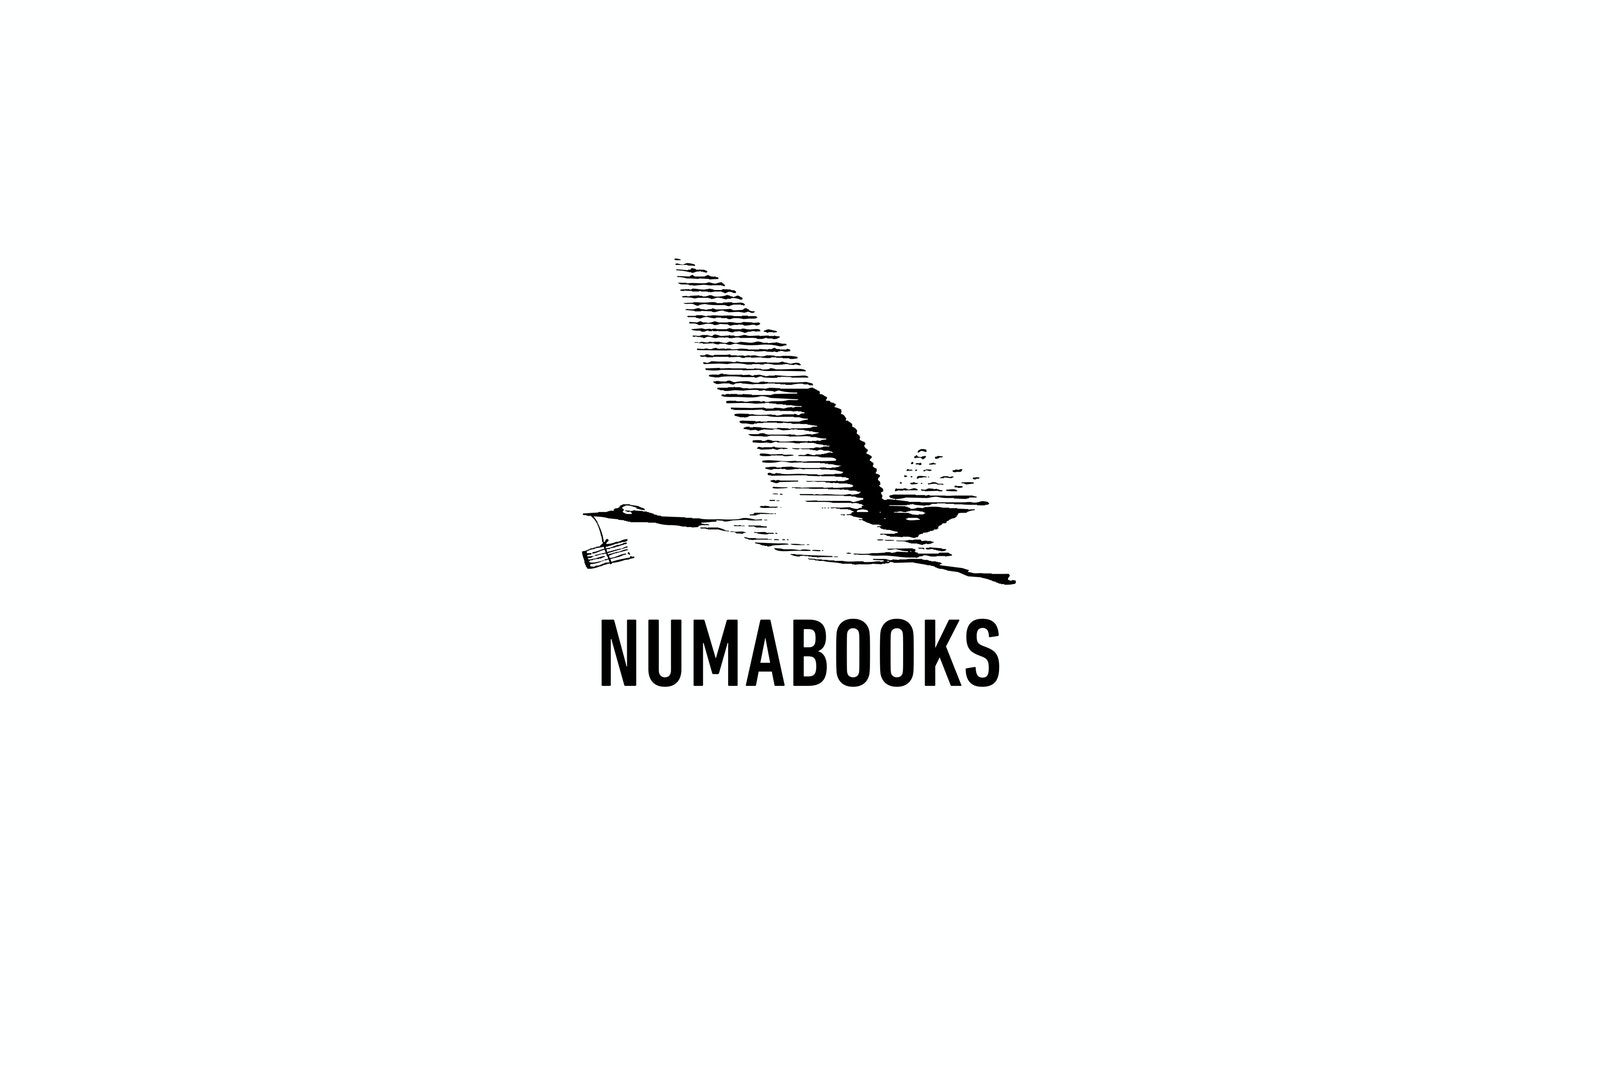 Numabooks